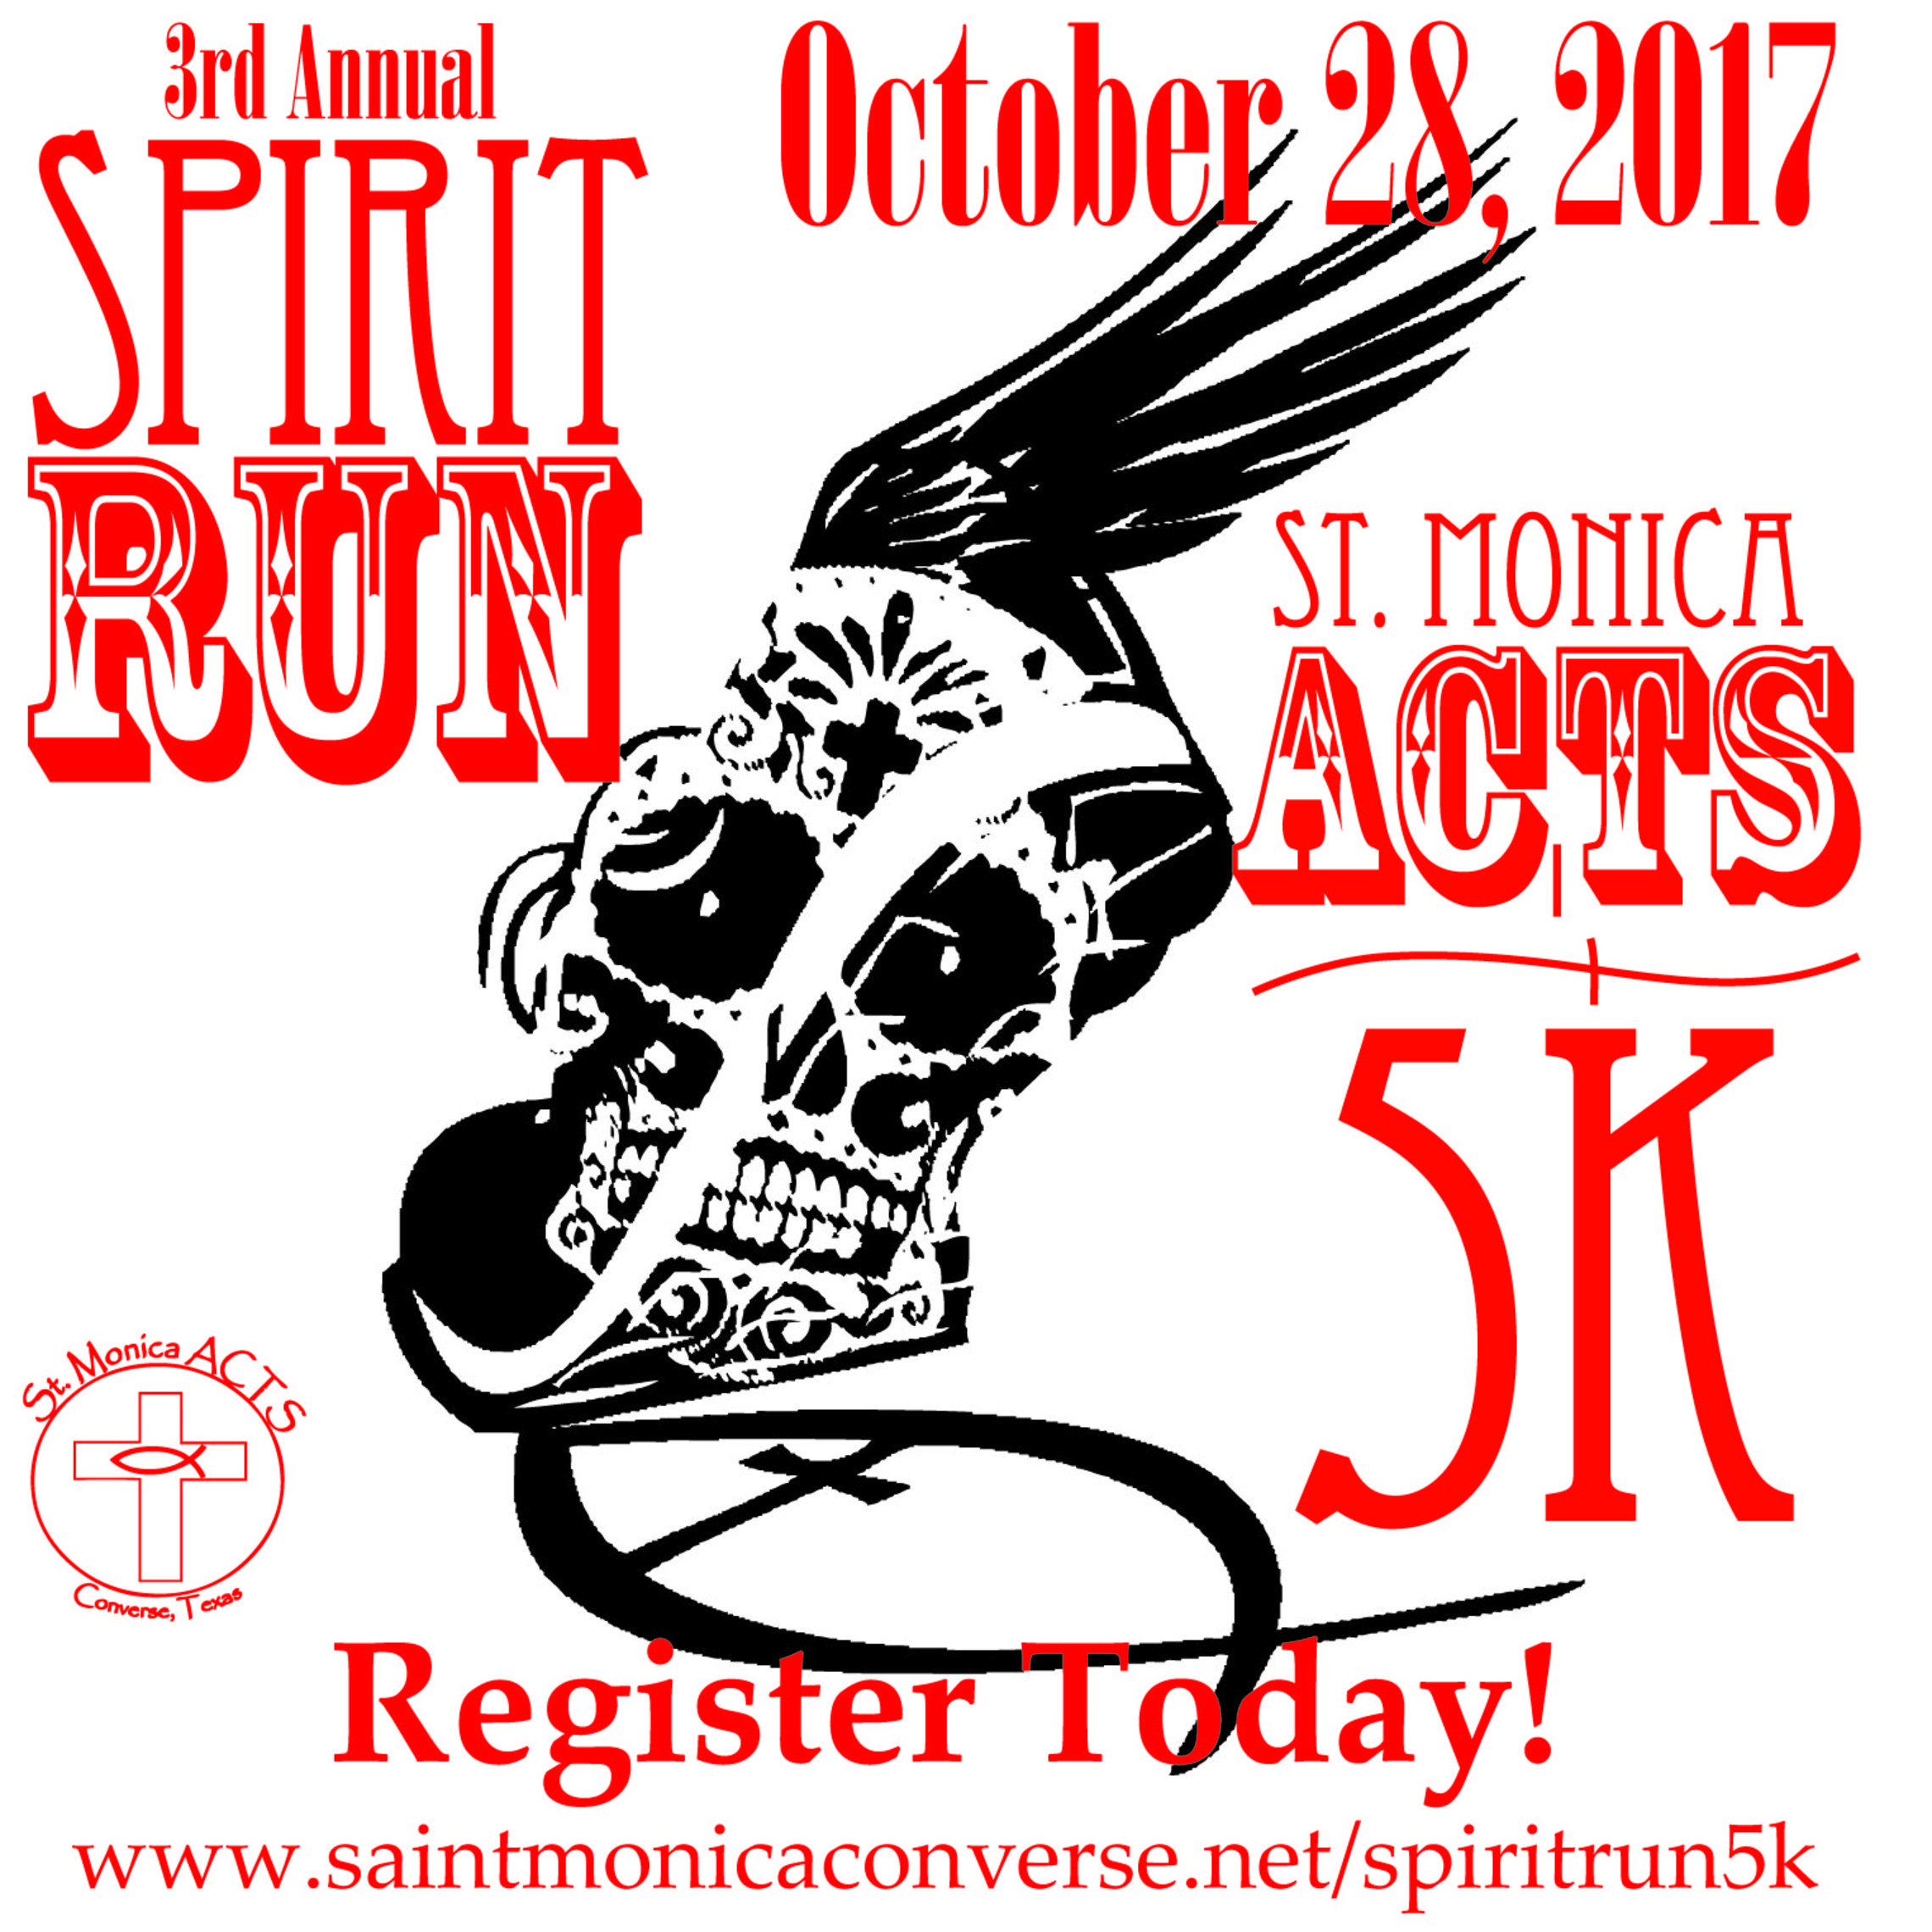 Acts 5k Spirit Run Promo1